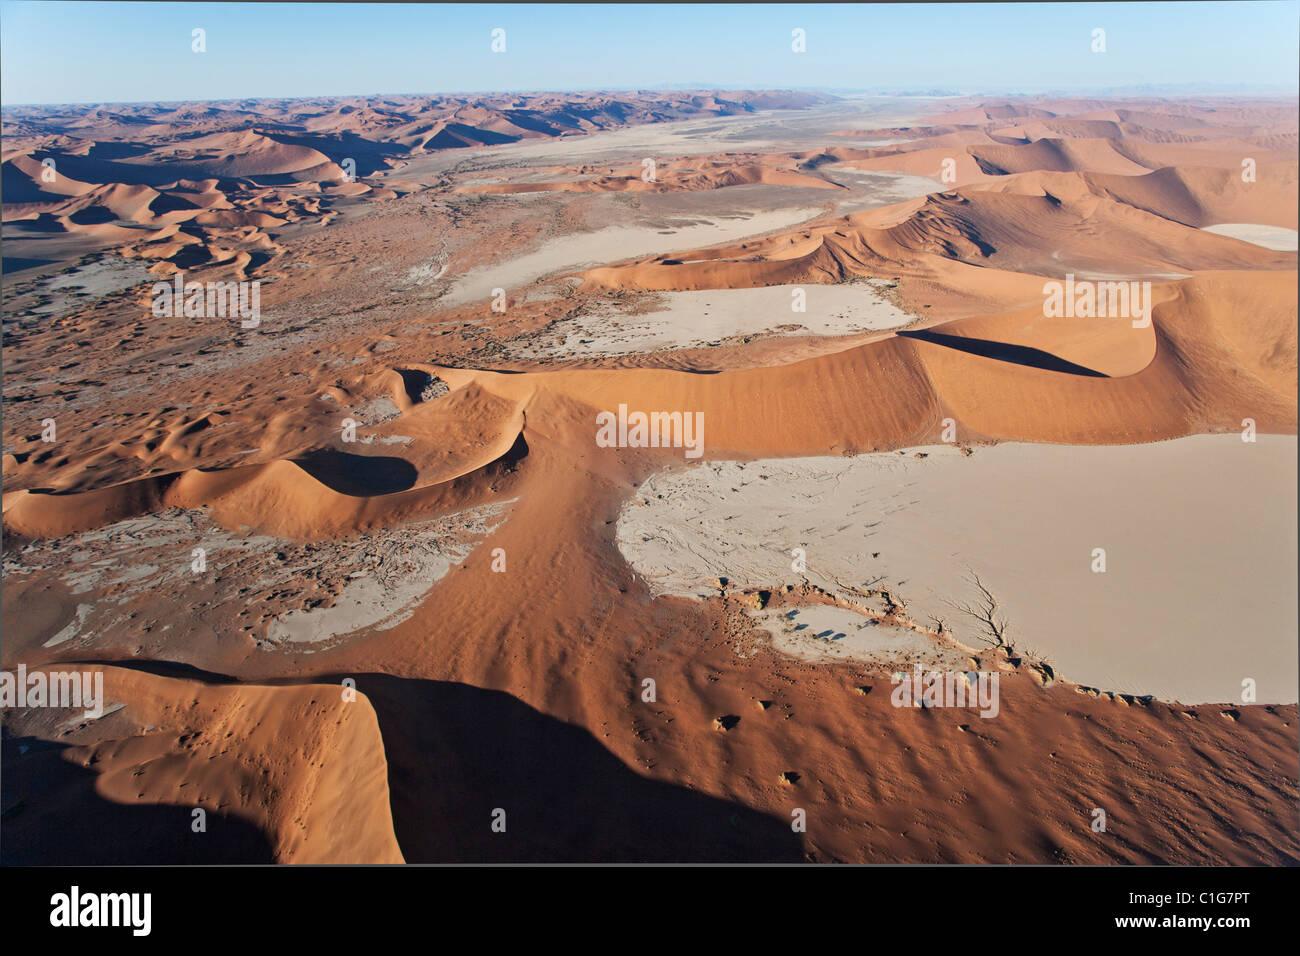 Dans Dead Vlei Sossusvlei dans le désert du Namib. Namib-Naukluft N.P, Namibie Photo Stock